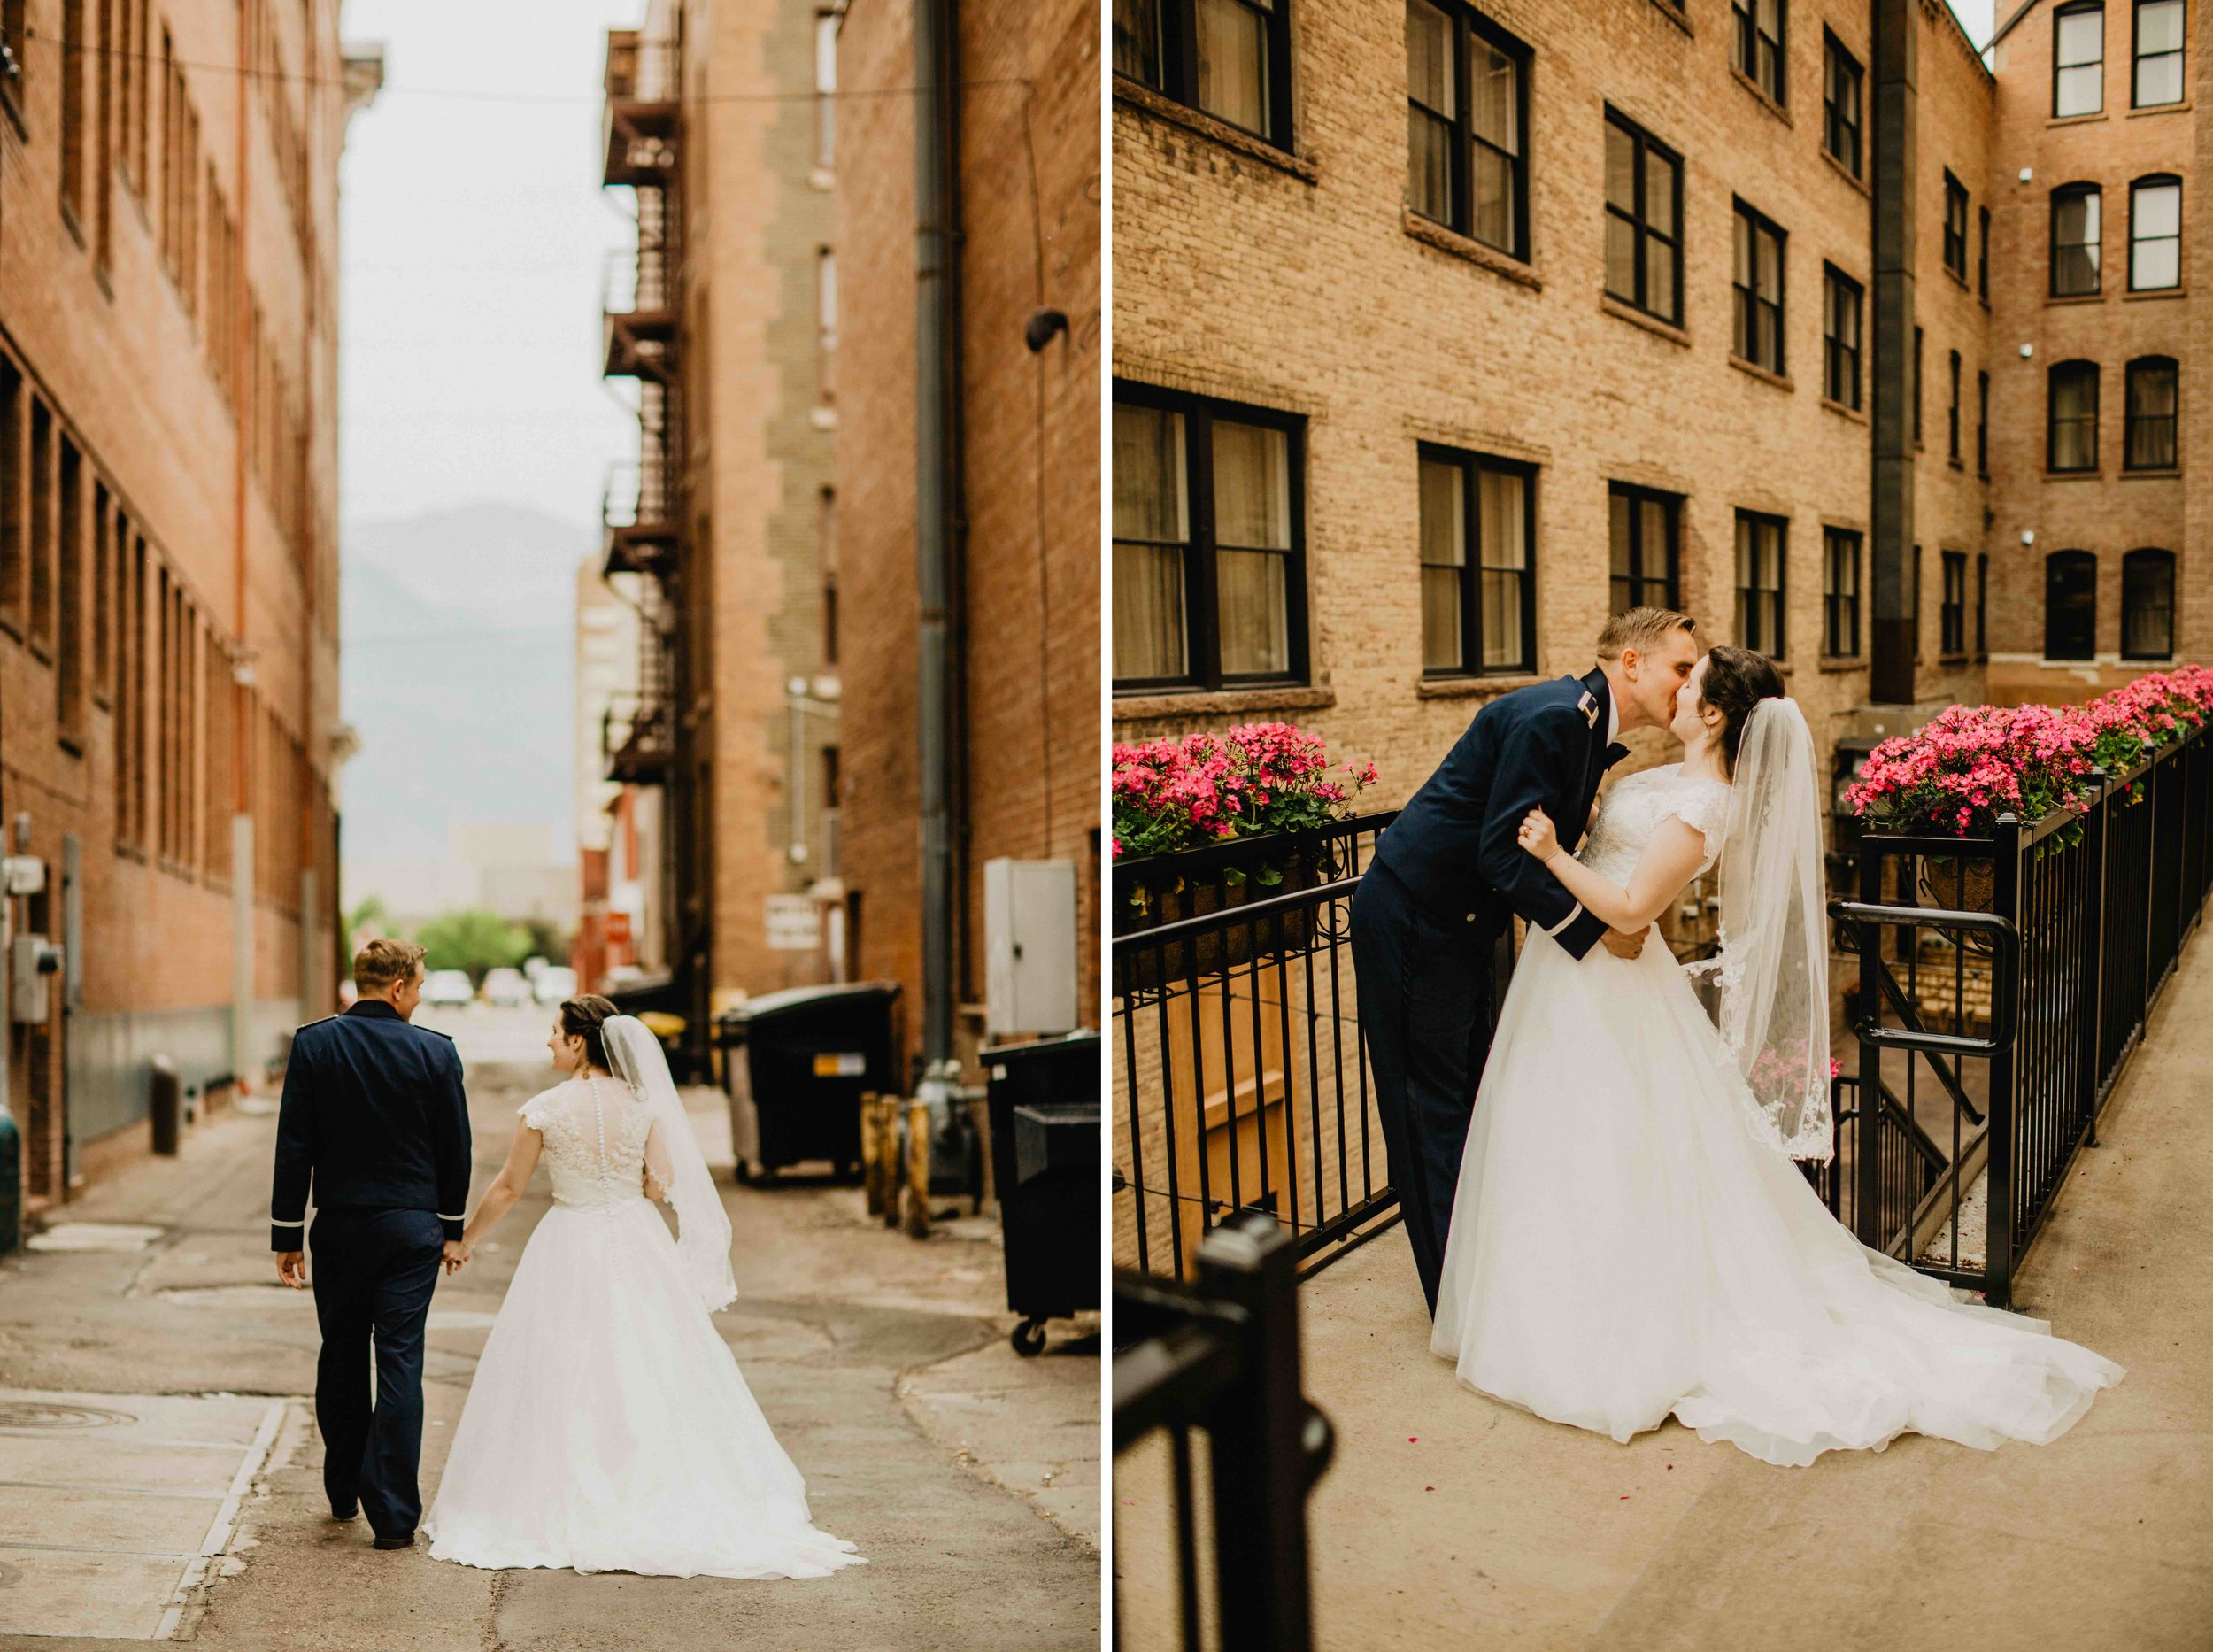 607A6044-colorado-wedding-photographer-denver-springs-vail--colorado-wedding-photographer-denver-springs-vail-.jpeg